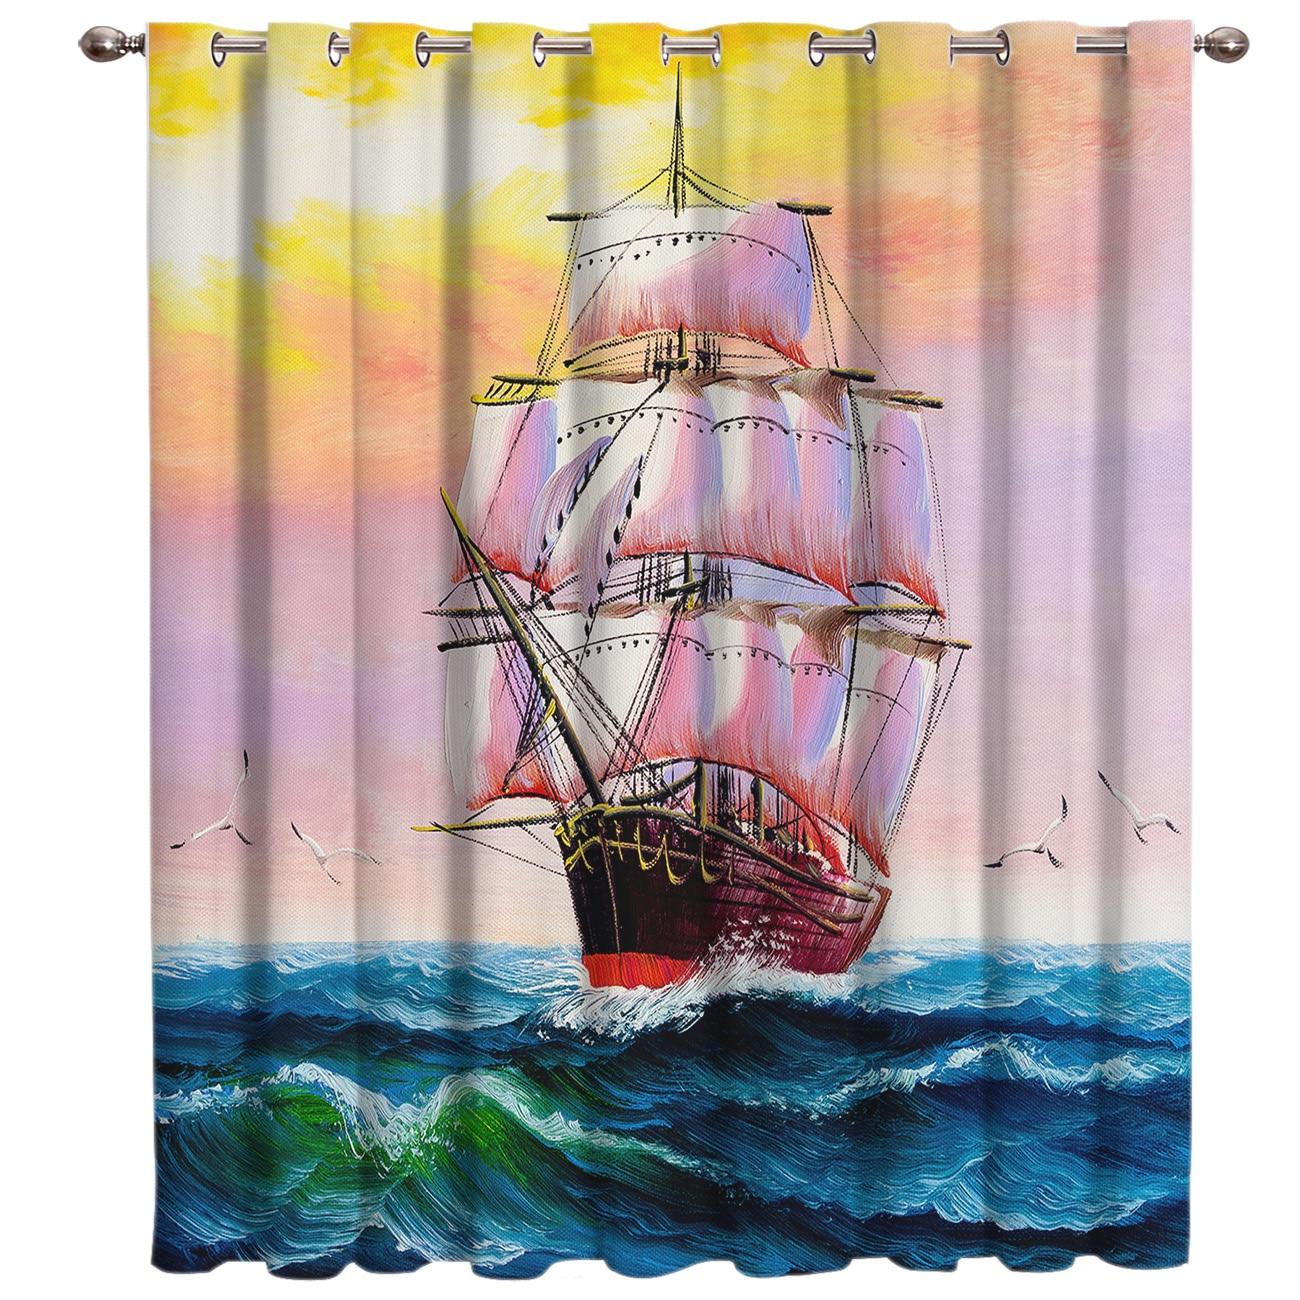 Ferry Oil Painting Retro Window Treatments Curtains Valance Curtain Rod Bathroom Blackout Bedroom Drapes Fabric Decor Kids